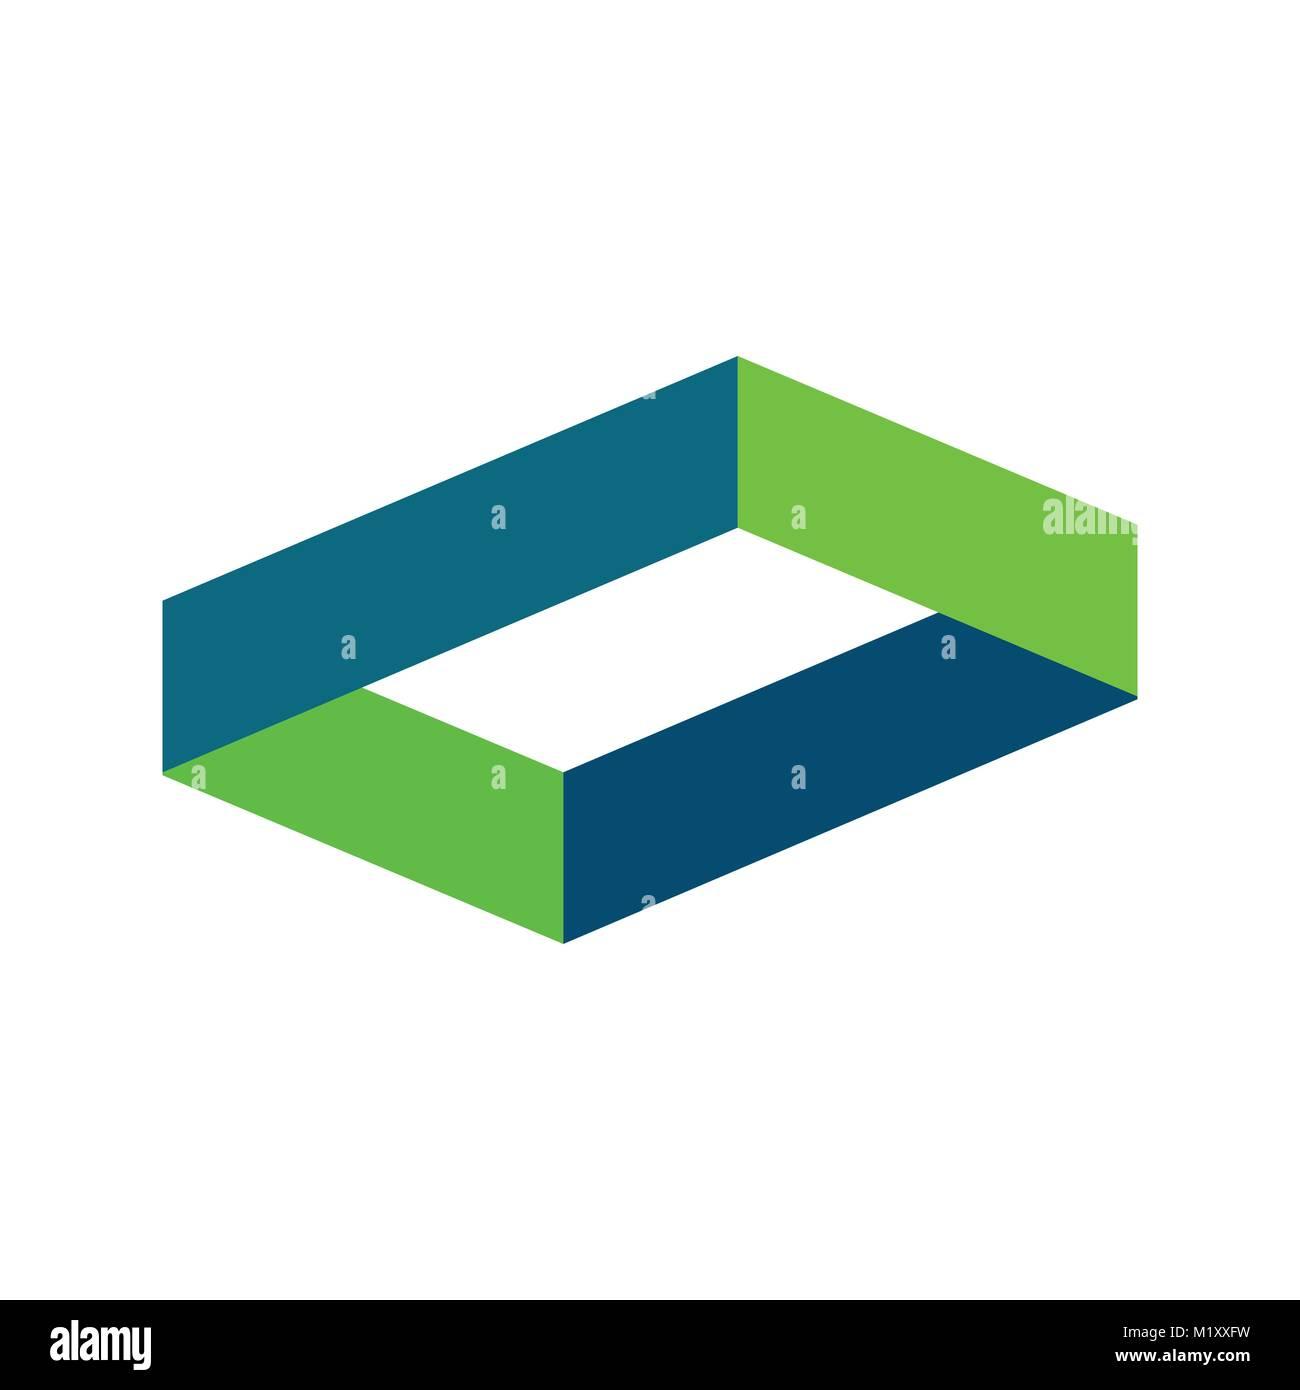 Hexagonal Shape Intersection Symbol Vector Illustration Graphic